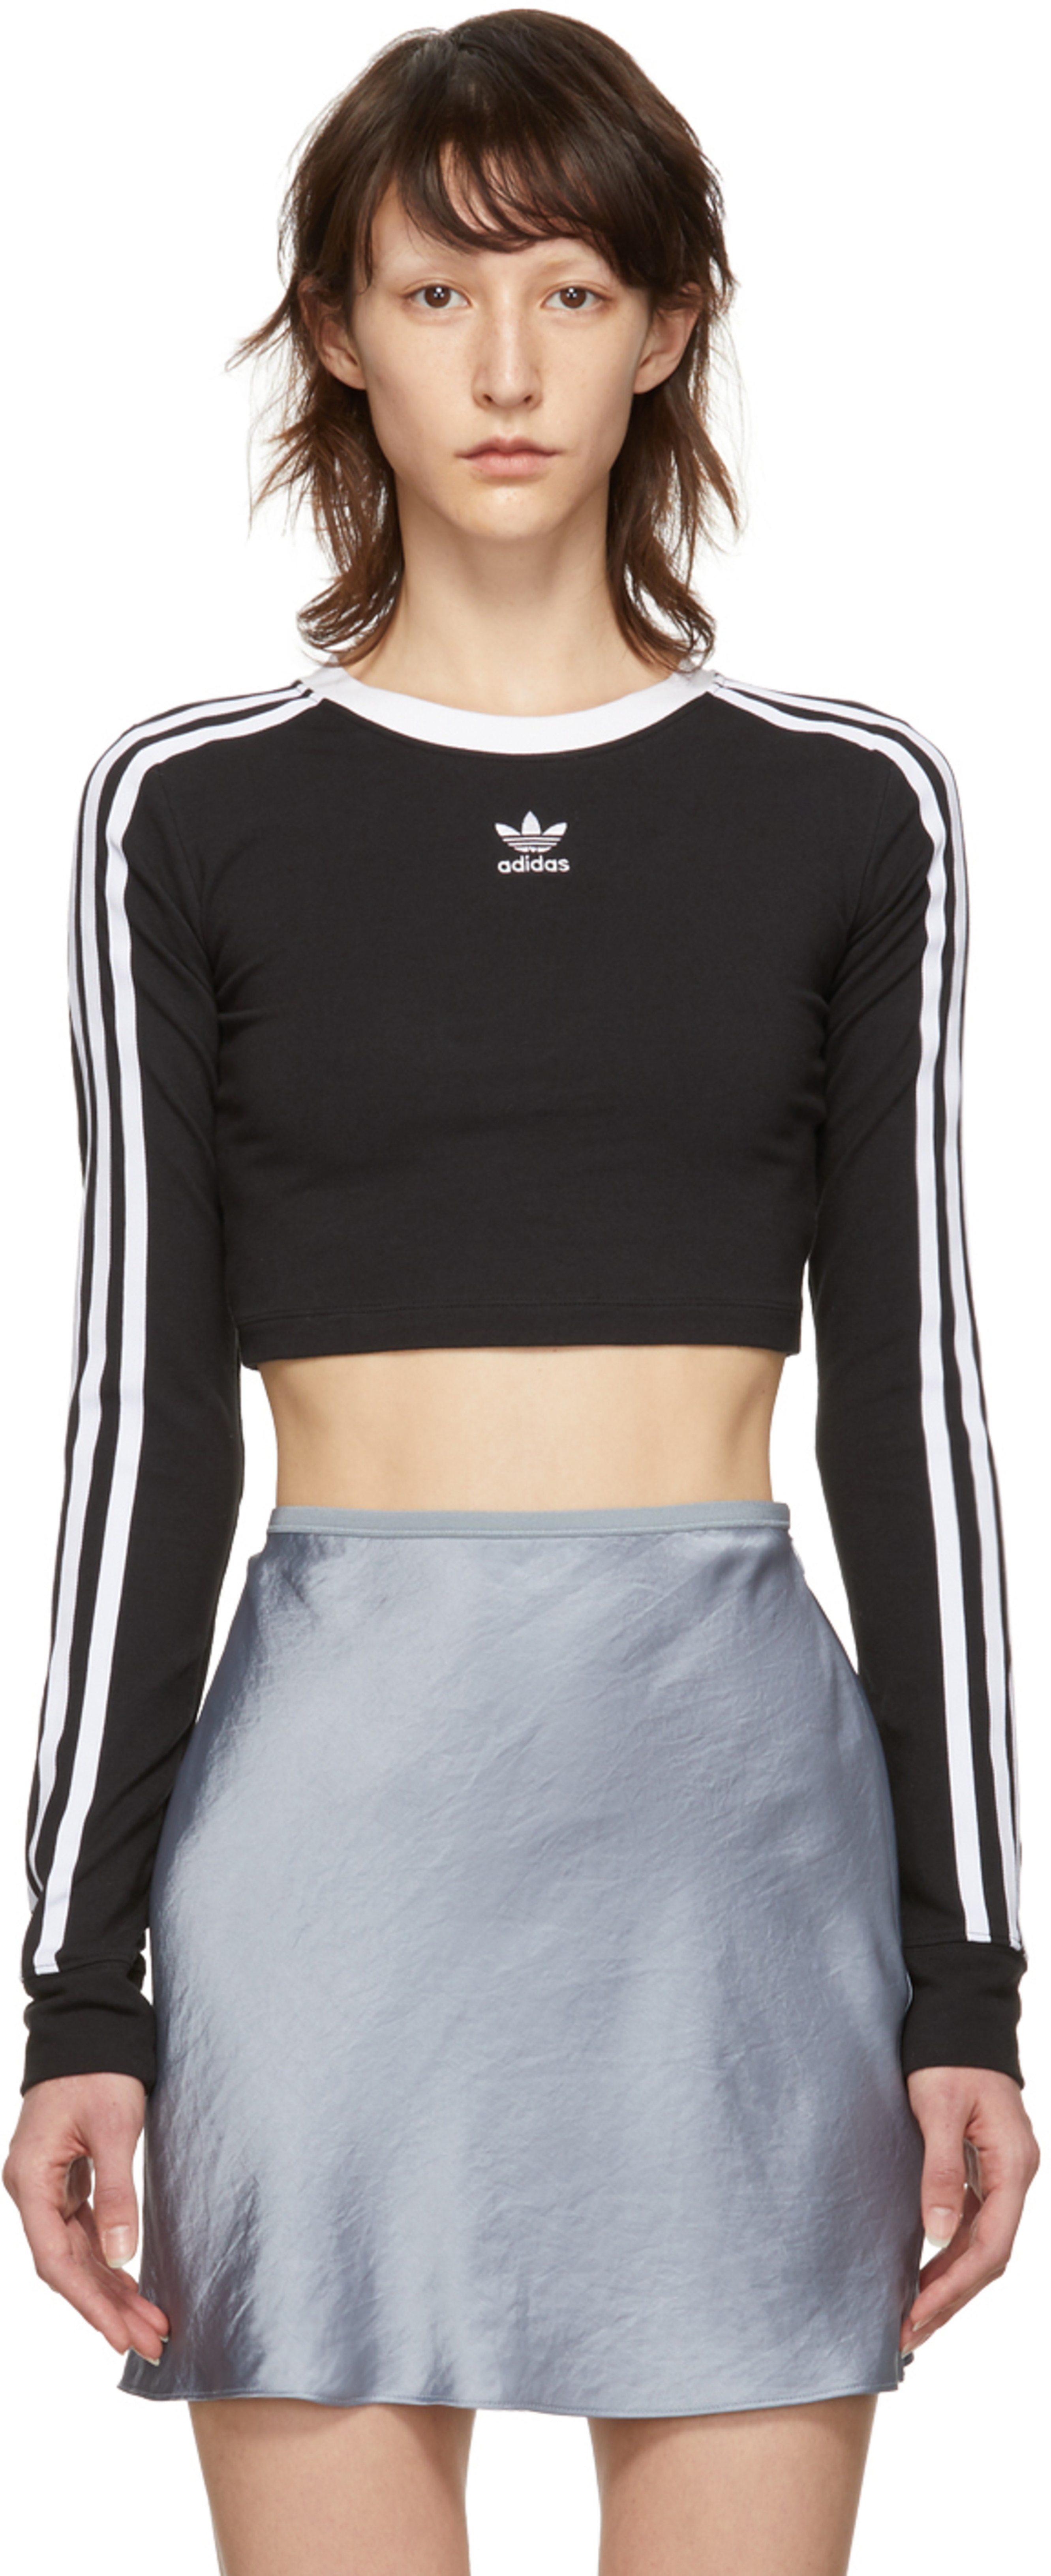 e0eee8a19781 Adidas Originals for Women SS19 Collection